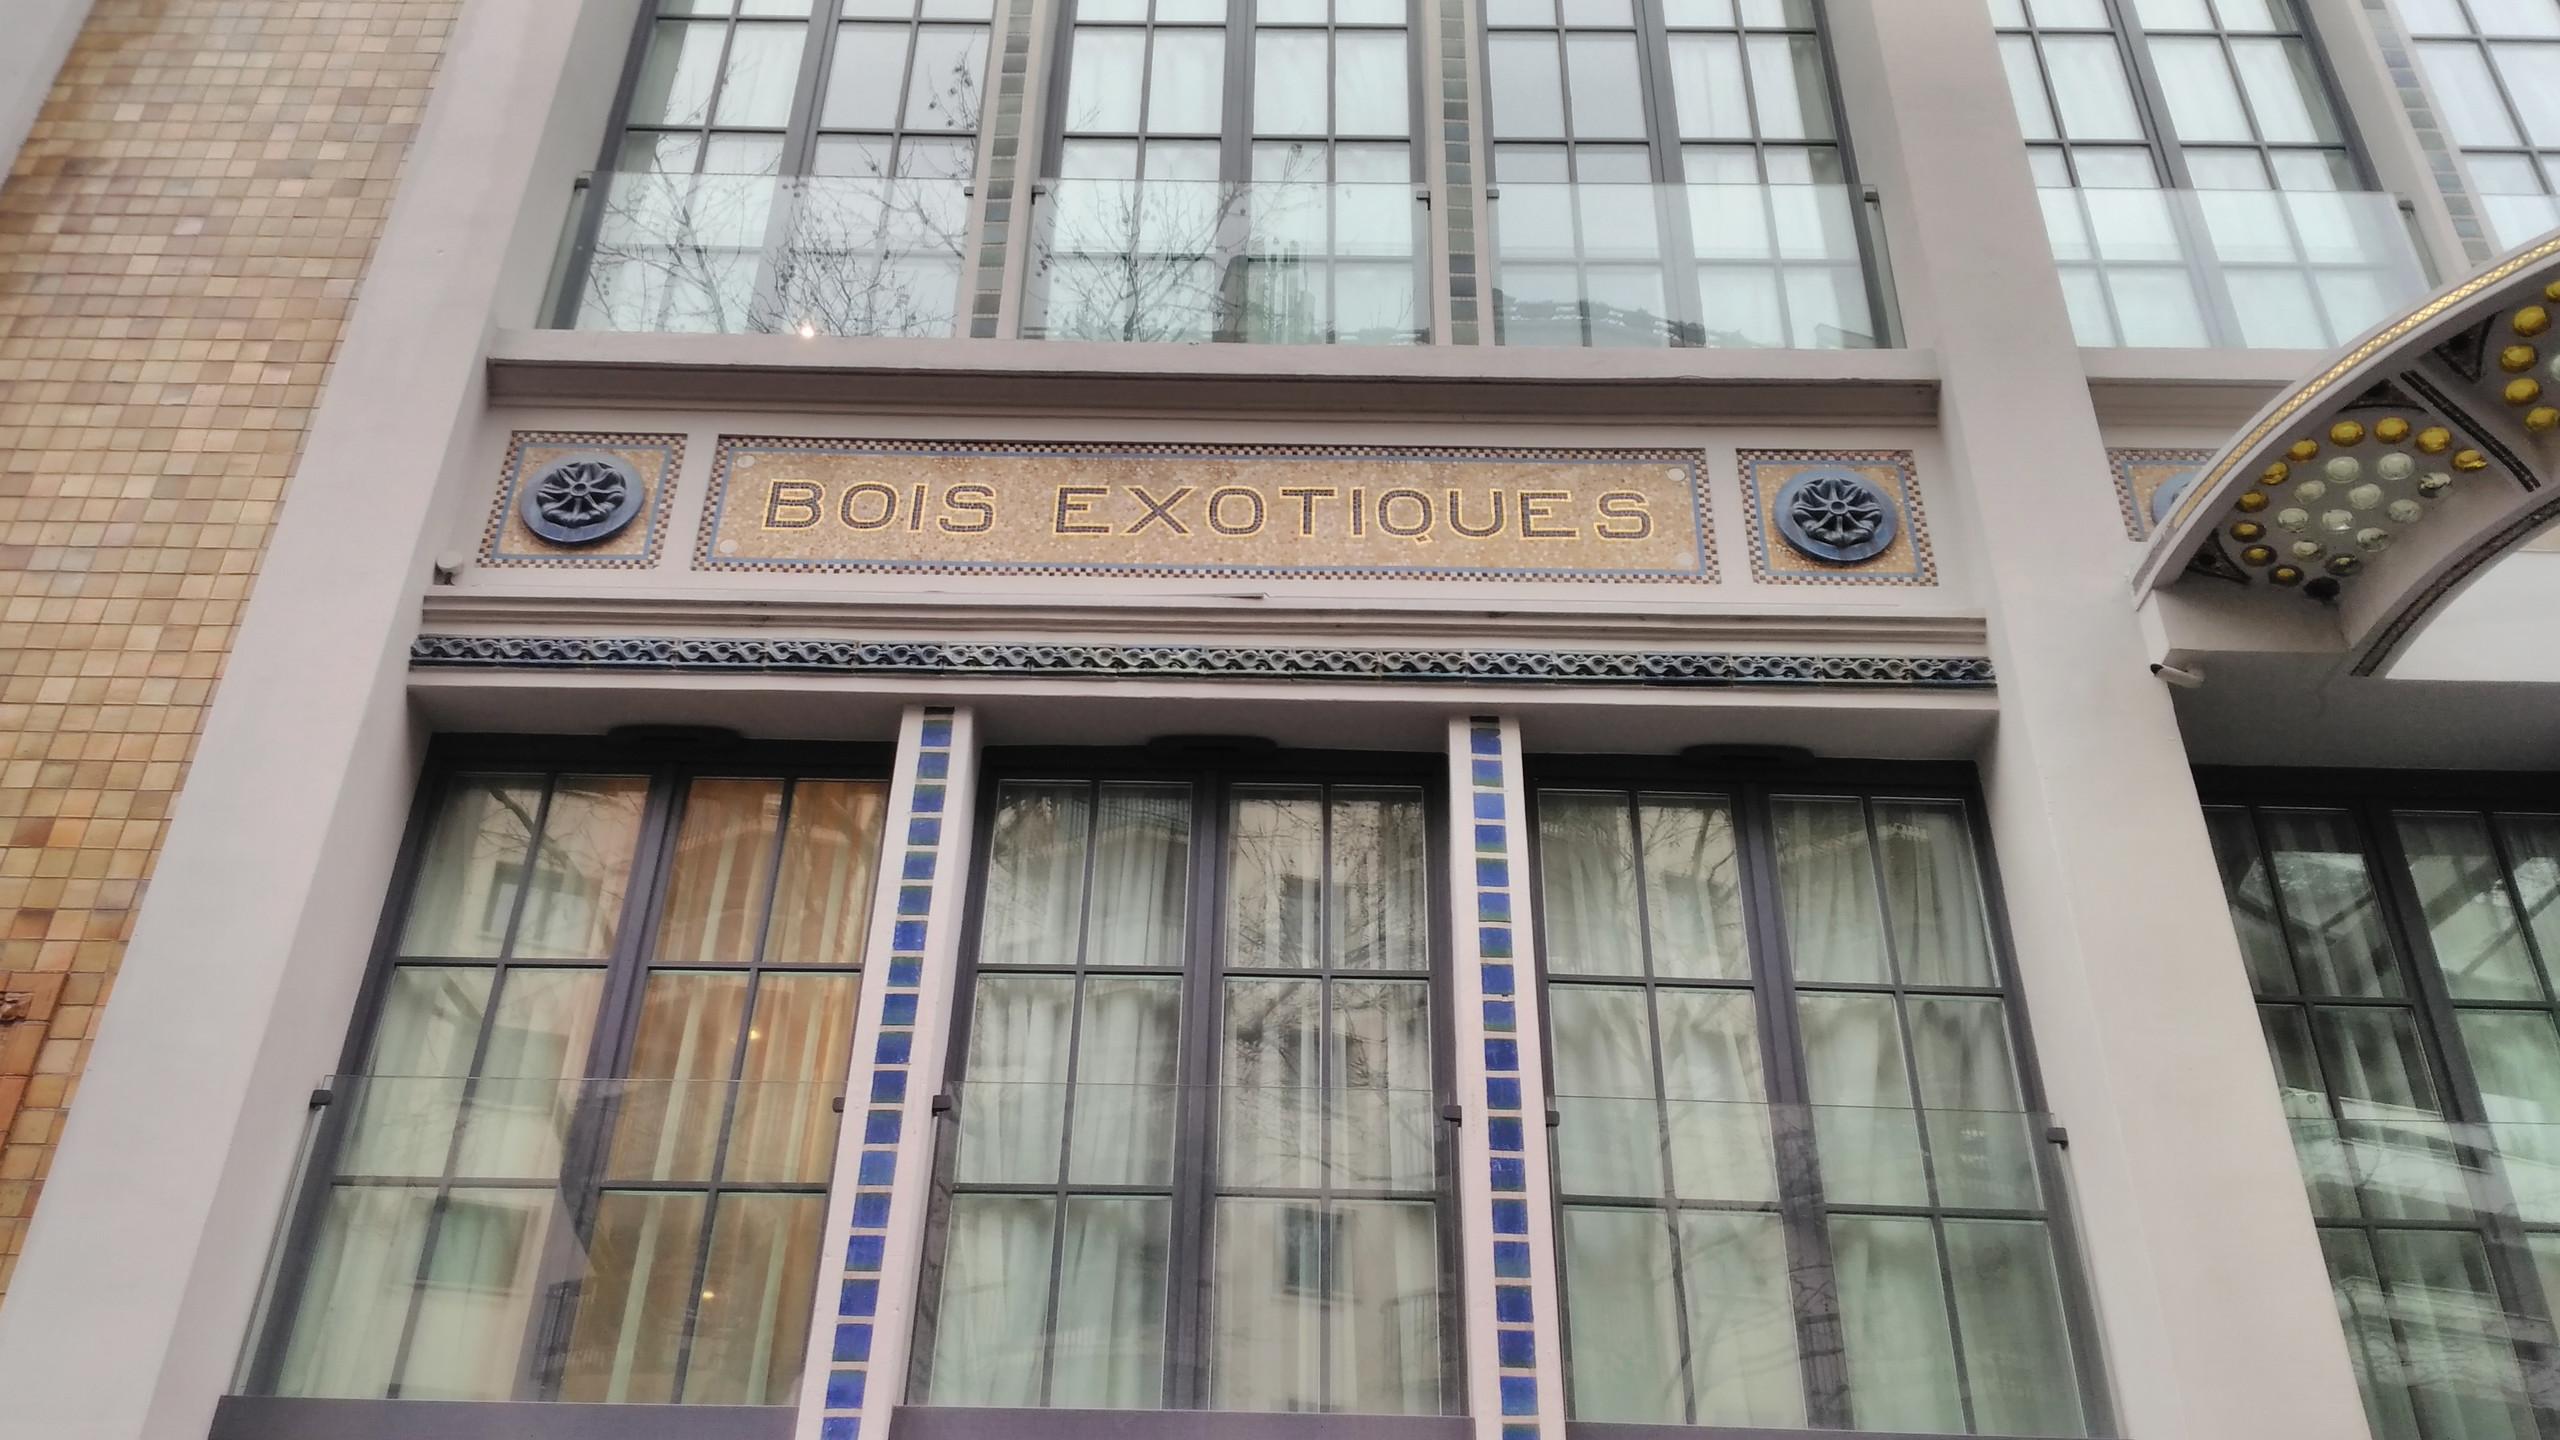 Maison Boutet - Façade